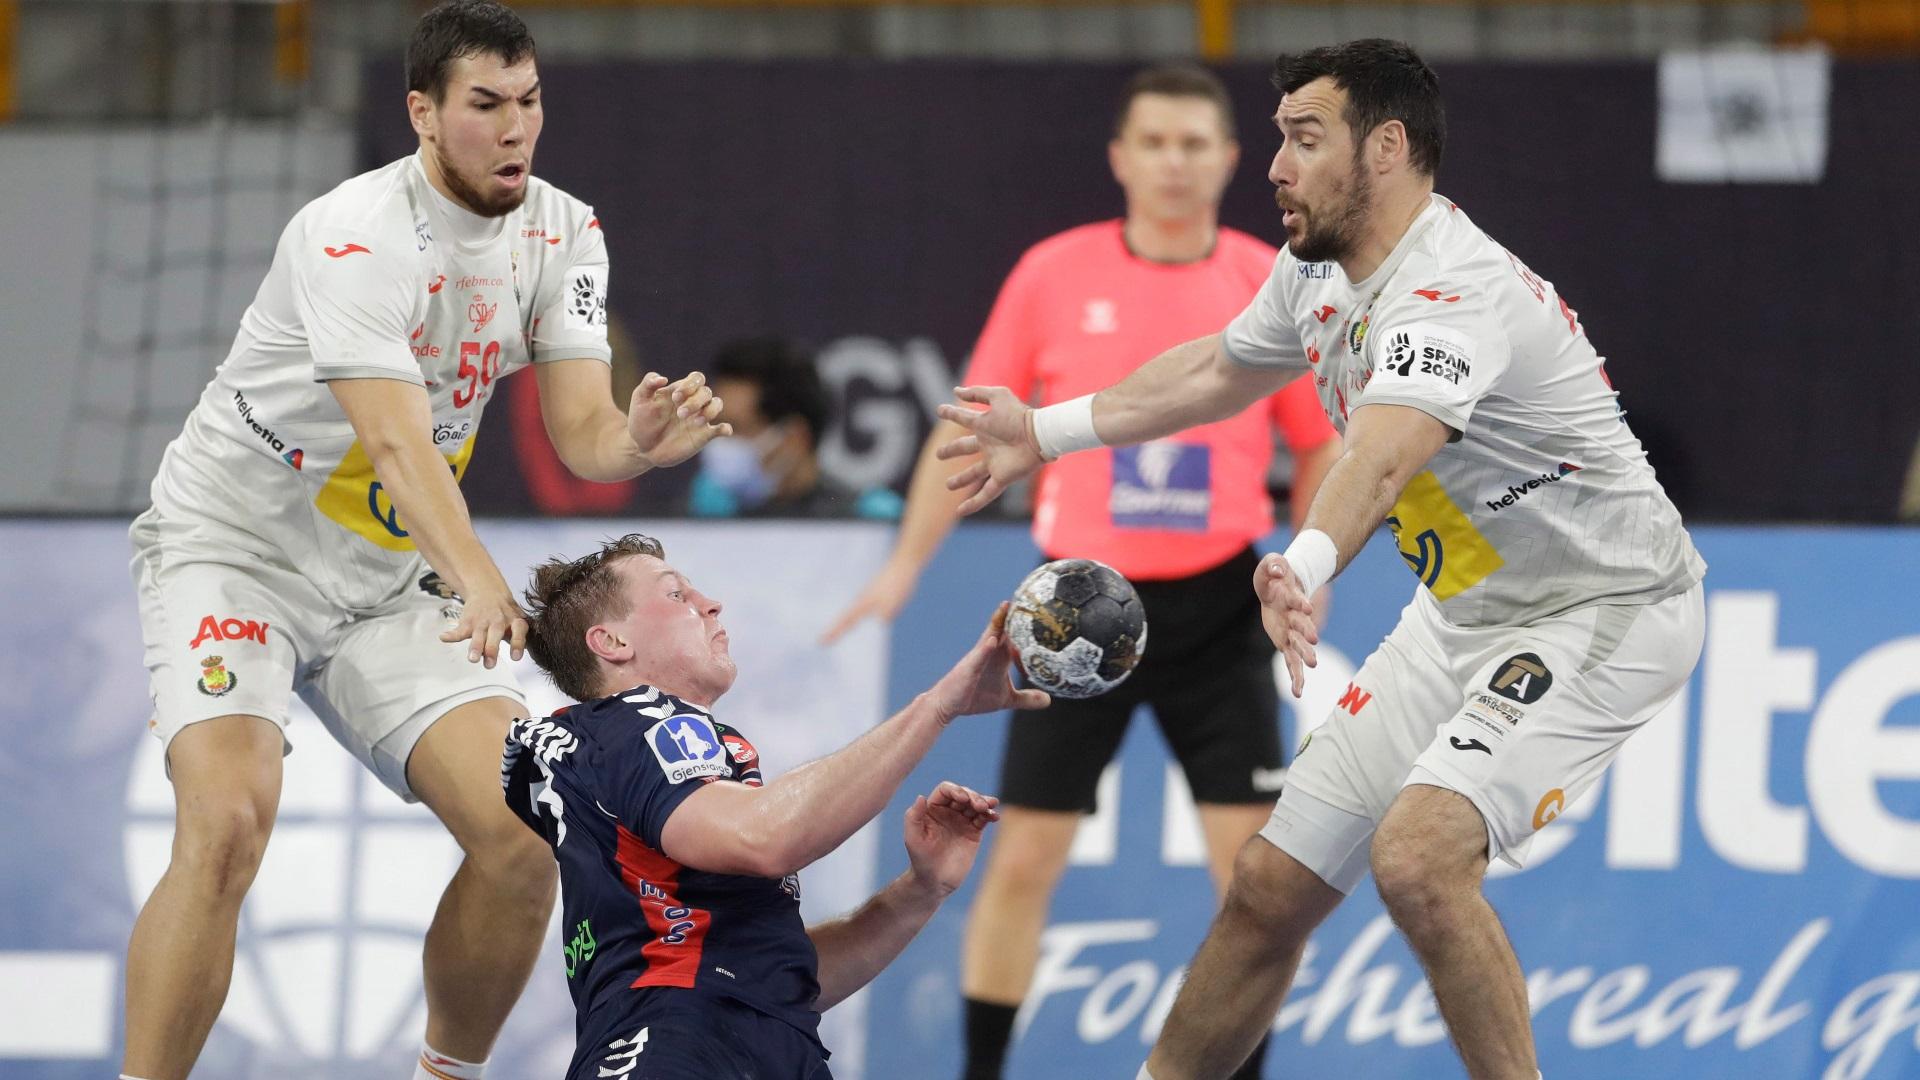 Campeonato Mundo masculino: 1/4 Final: España - Noruega